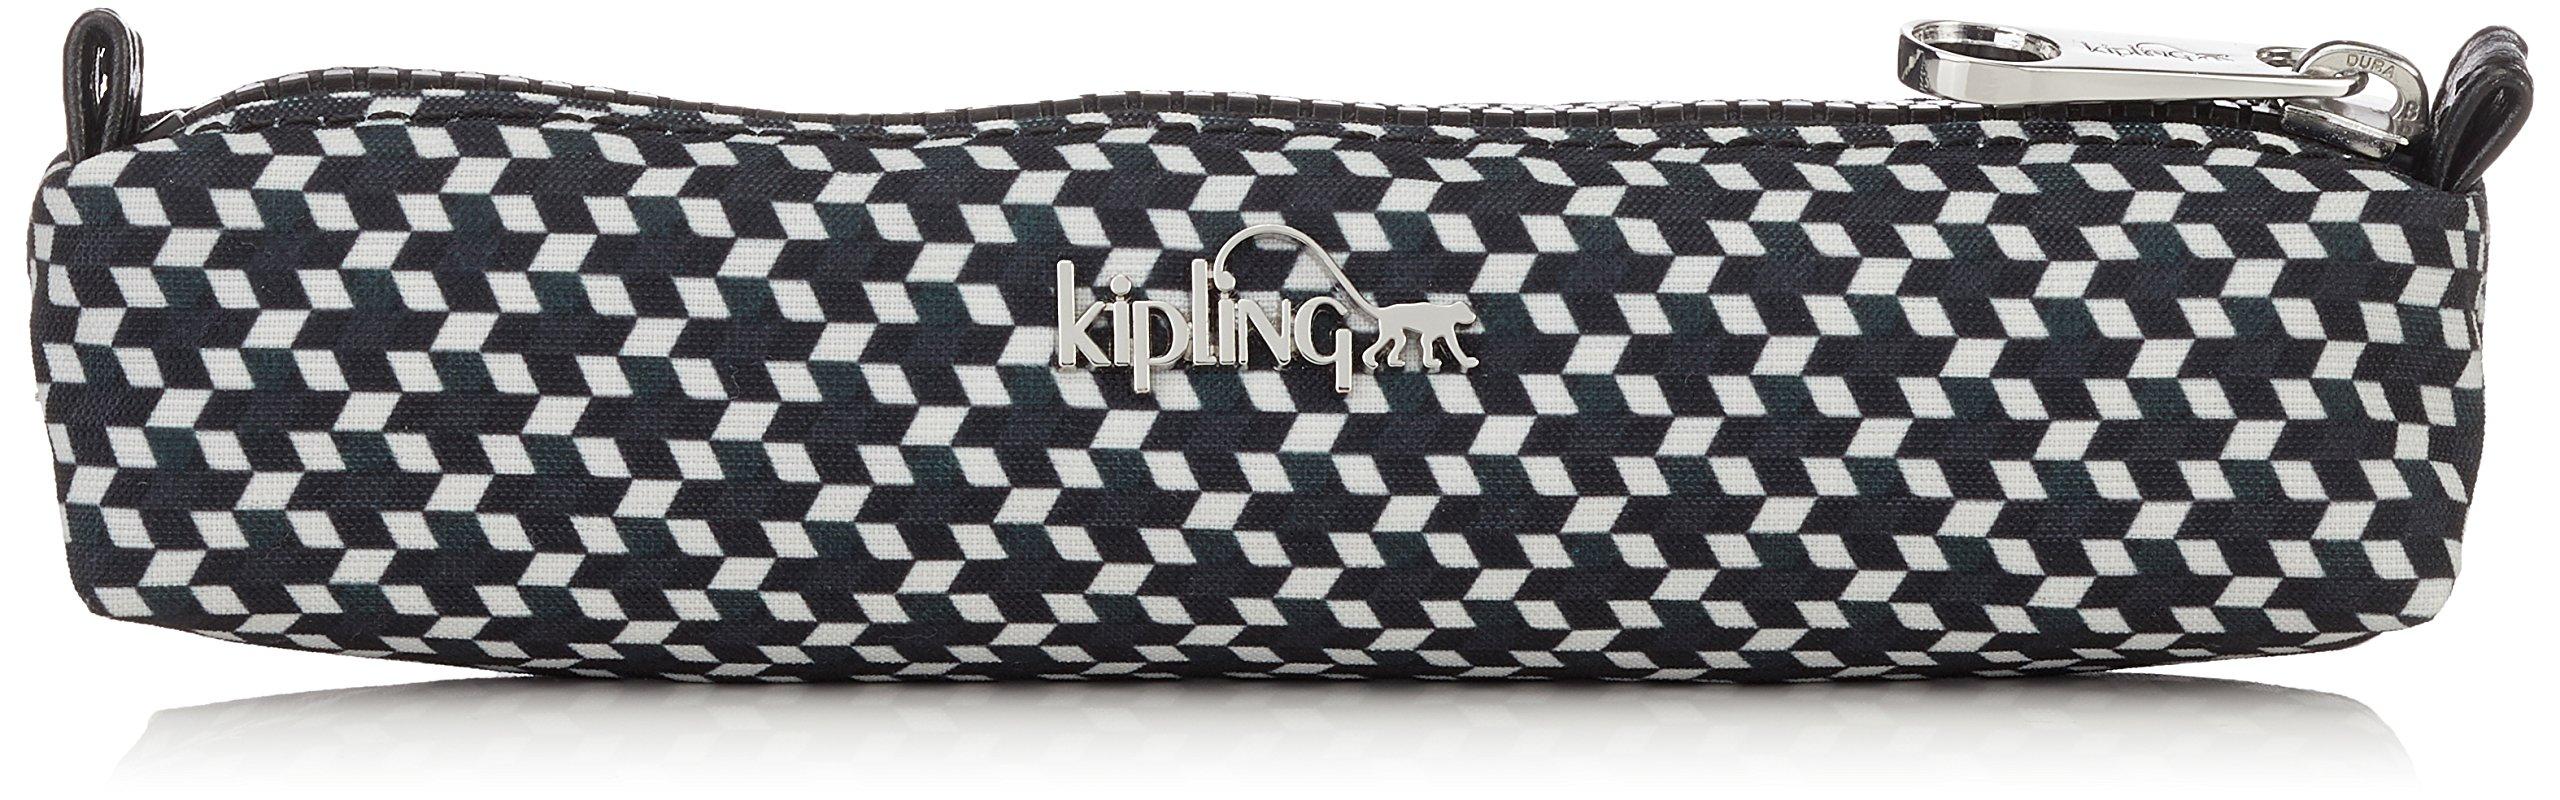 Kipling PHOIBE Estuches, 20 cm, 0.3 liters